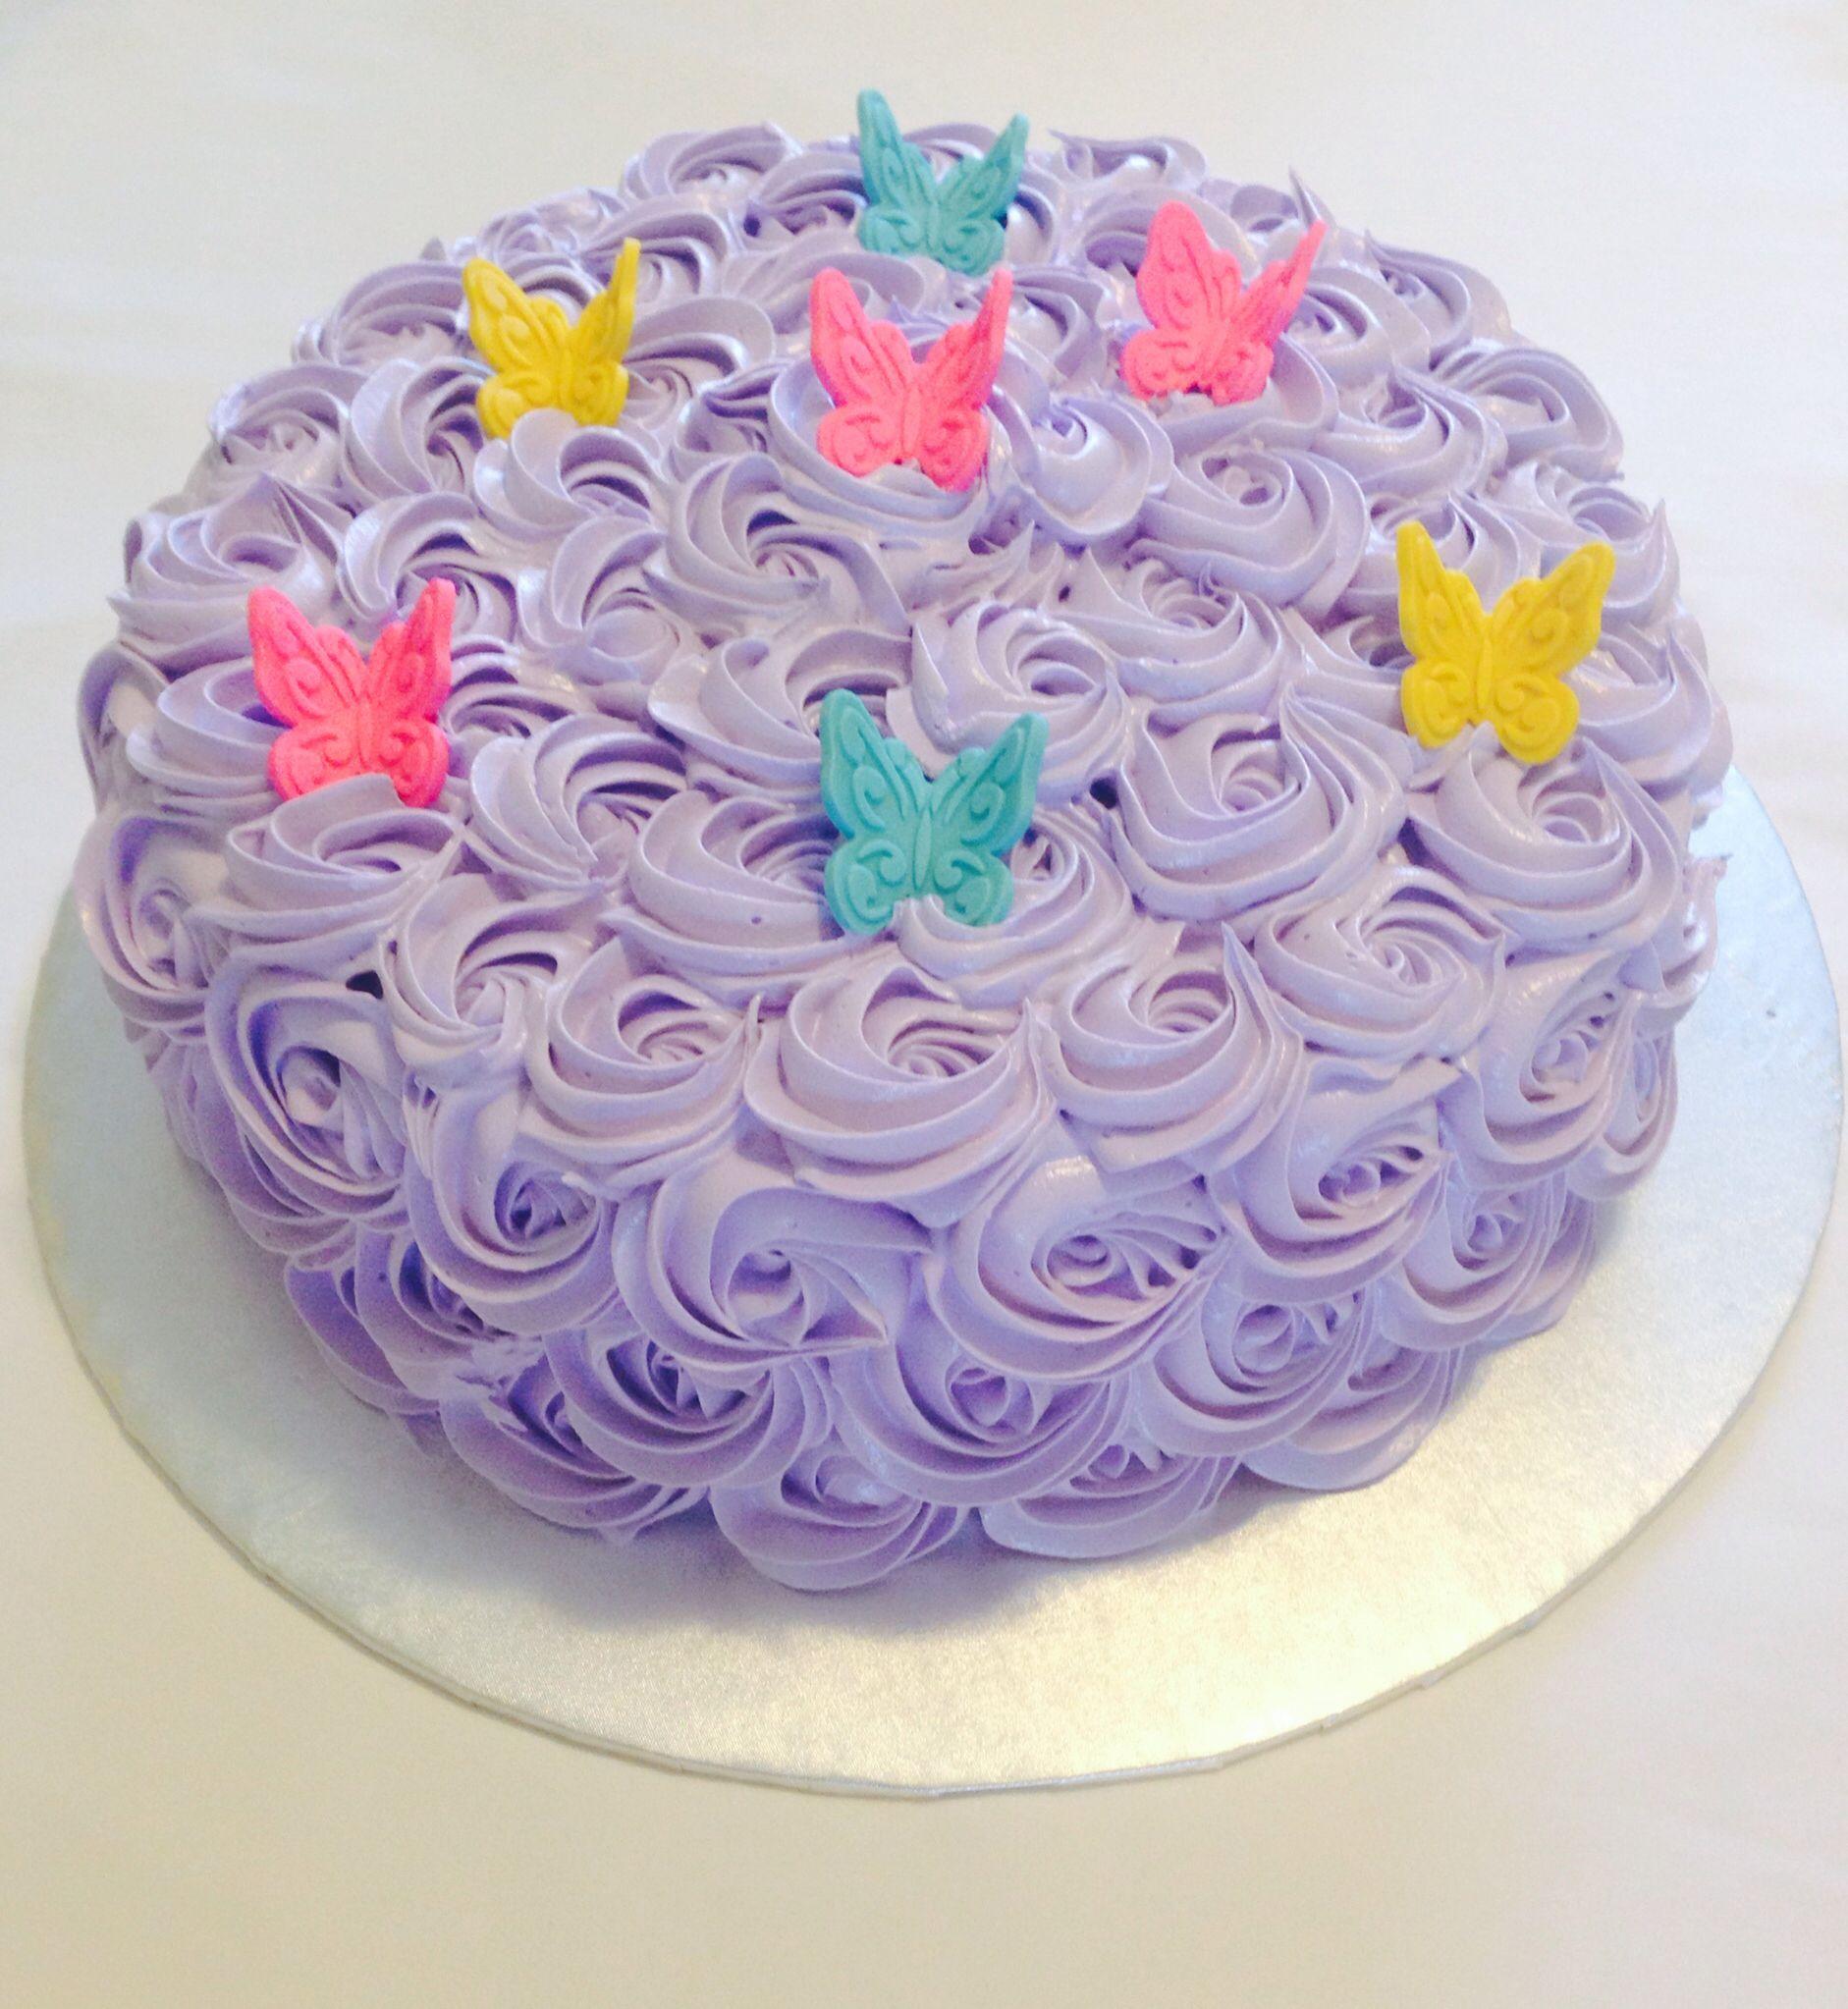 Dominican cake, swirl flower, merengue frosting, pineapple ...